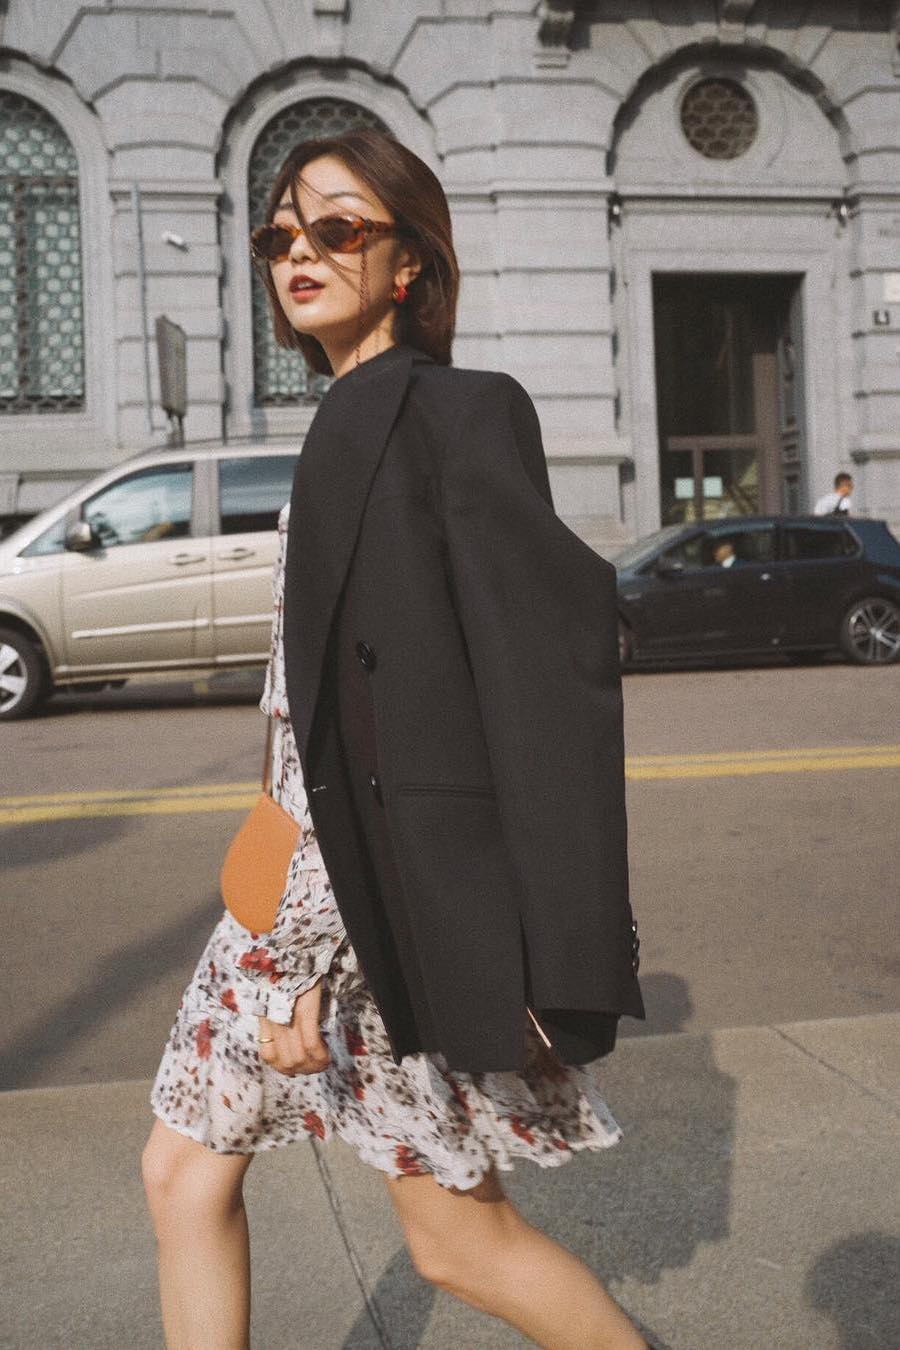 Black oversized blazer and floral dress